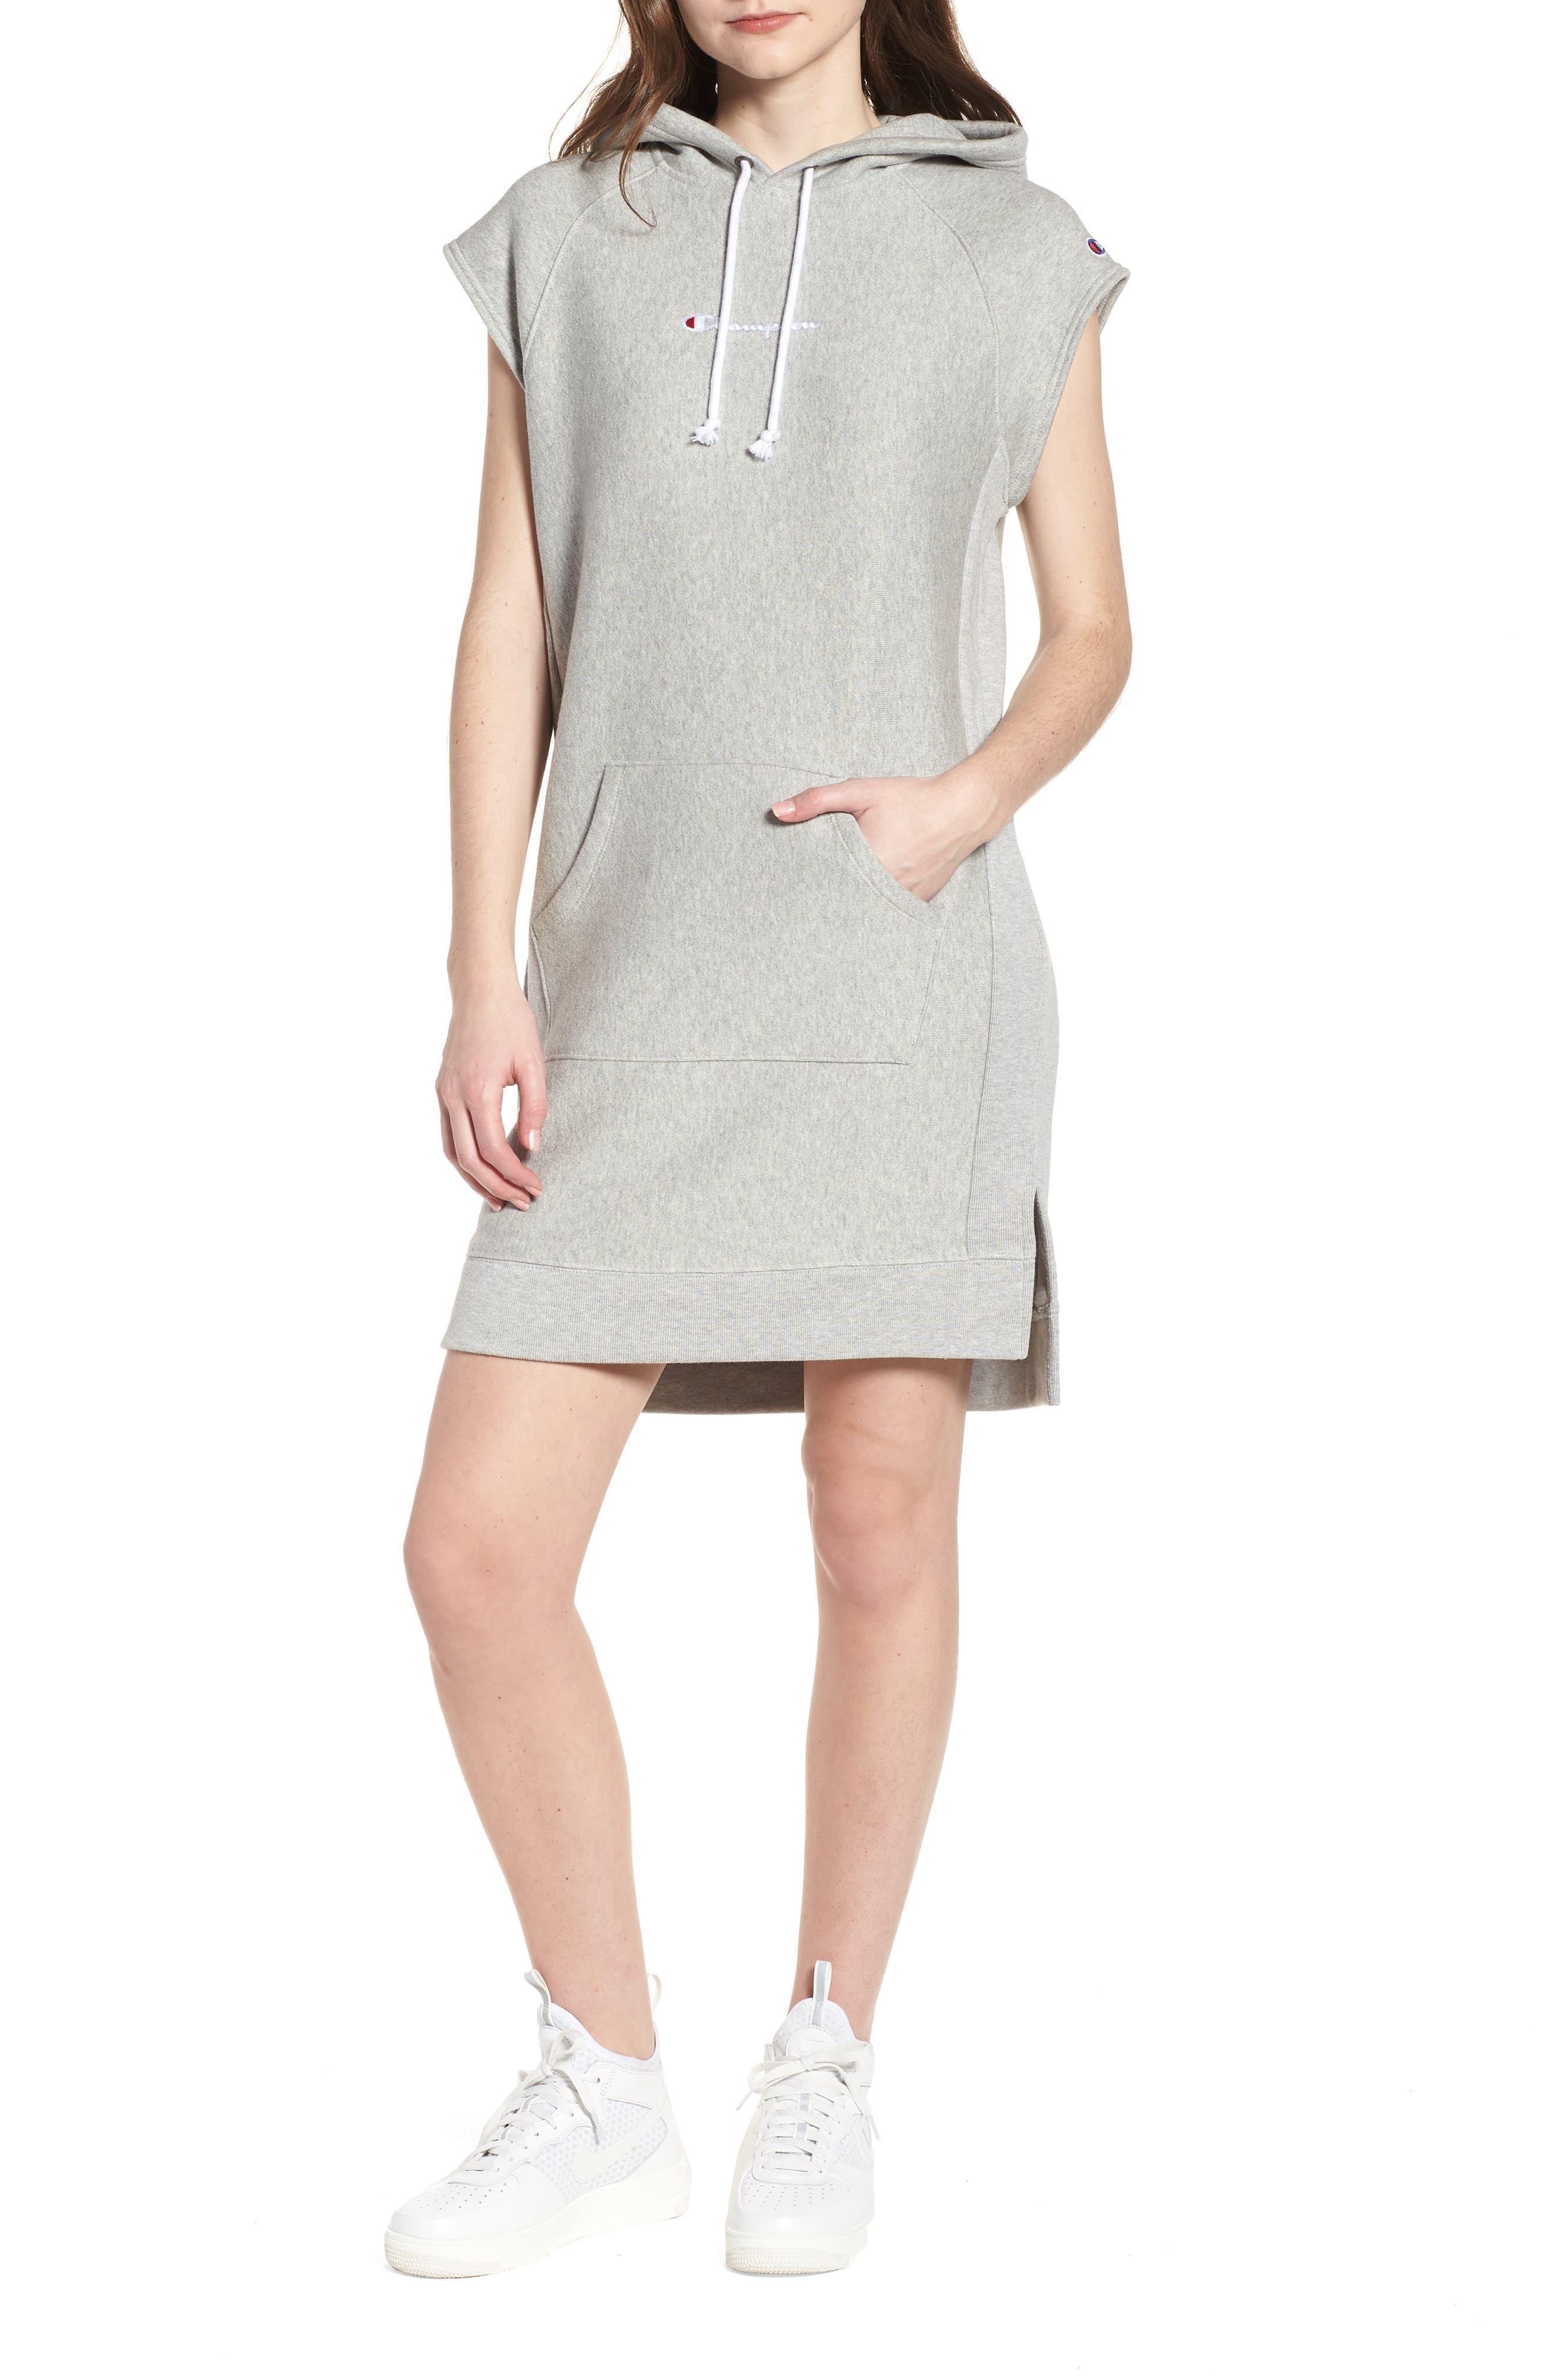 CHAMPION Hoodie Dress, Main, color, 021